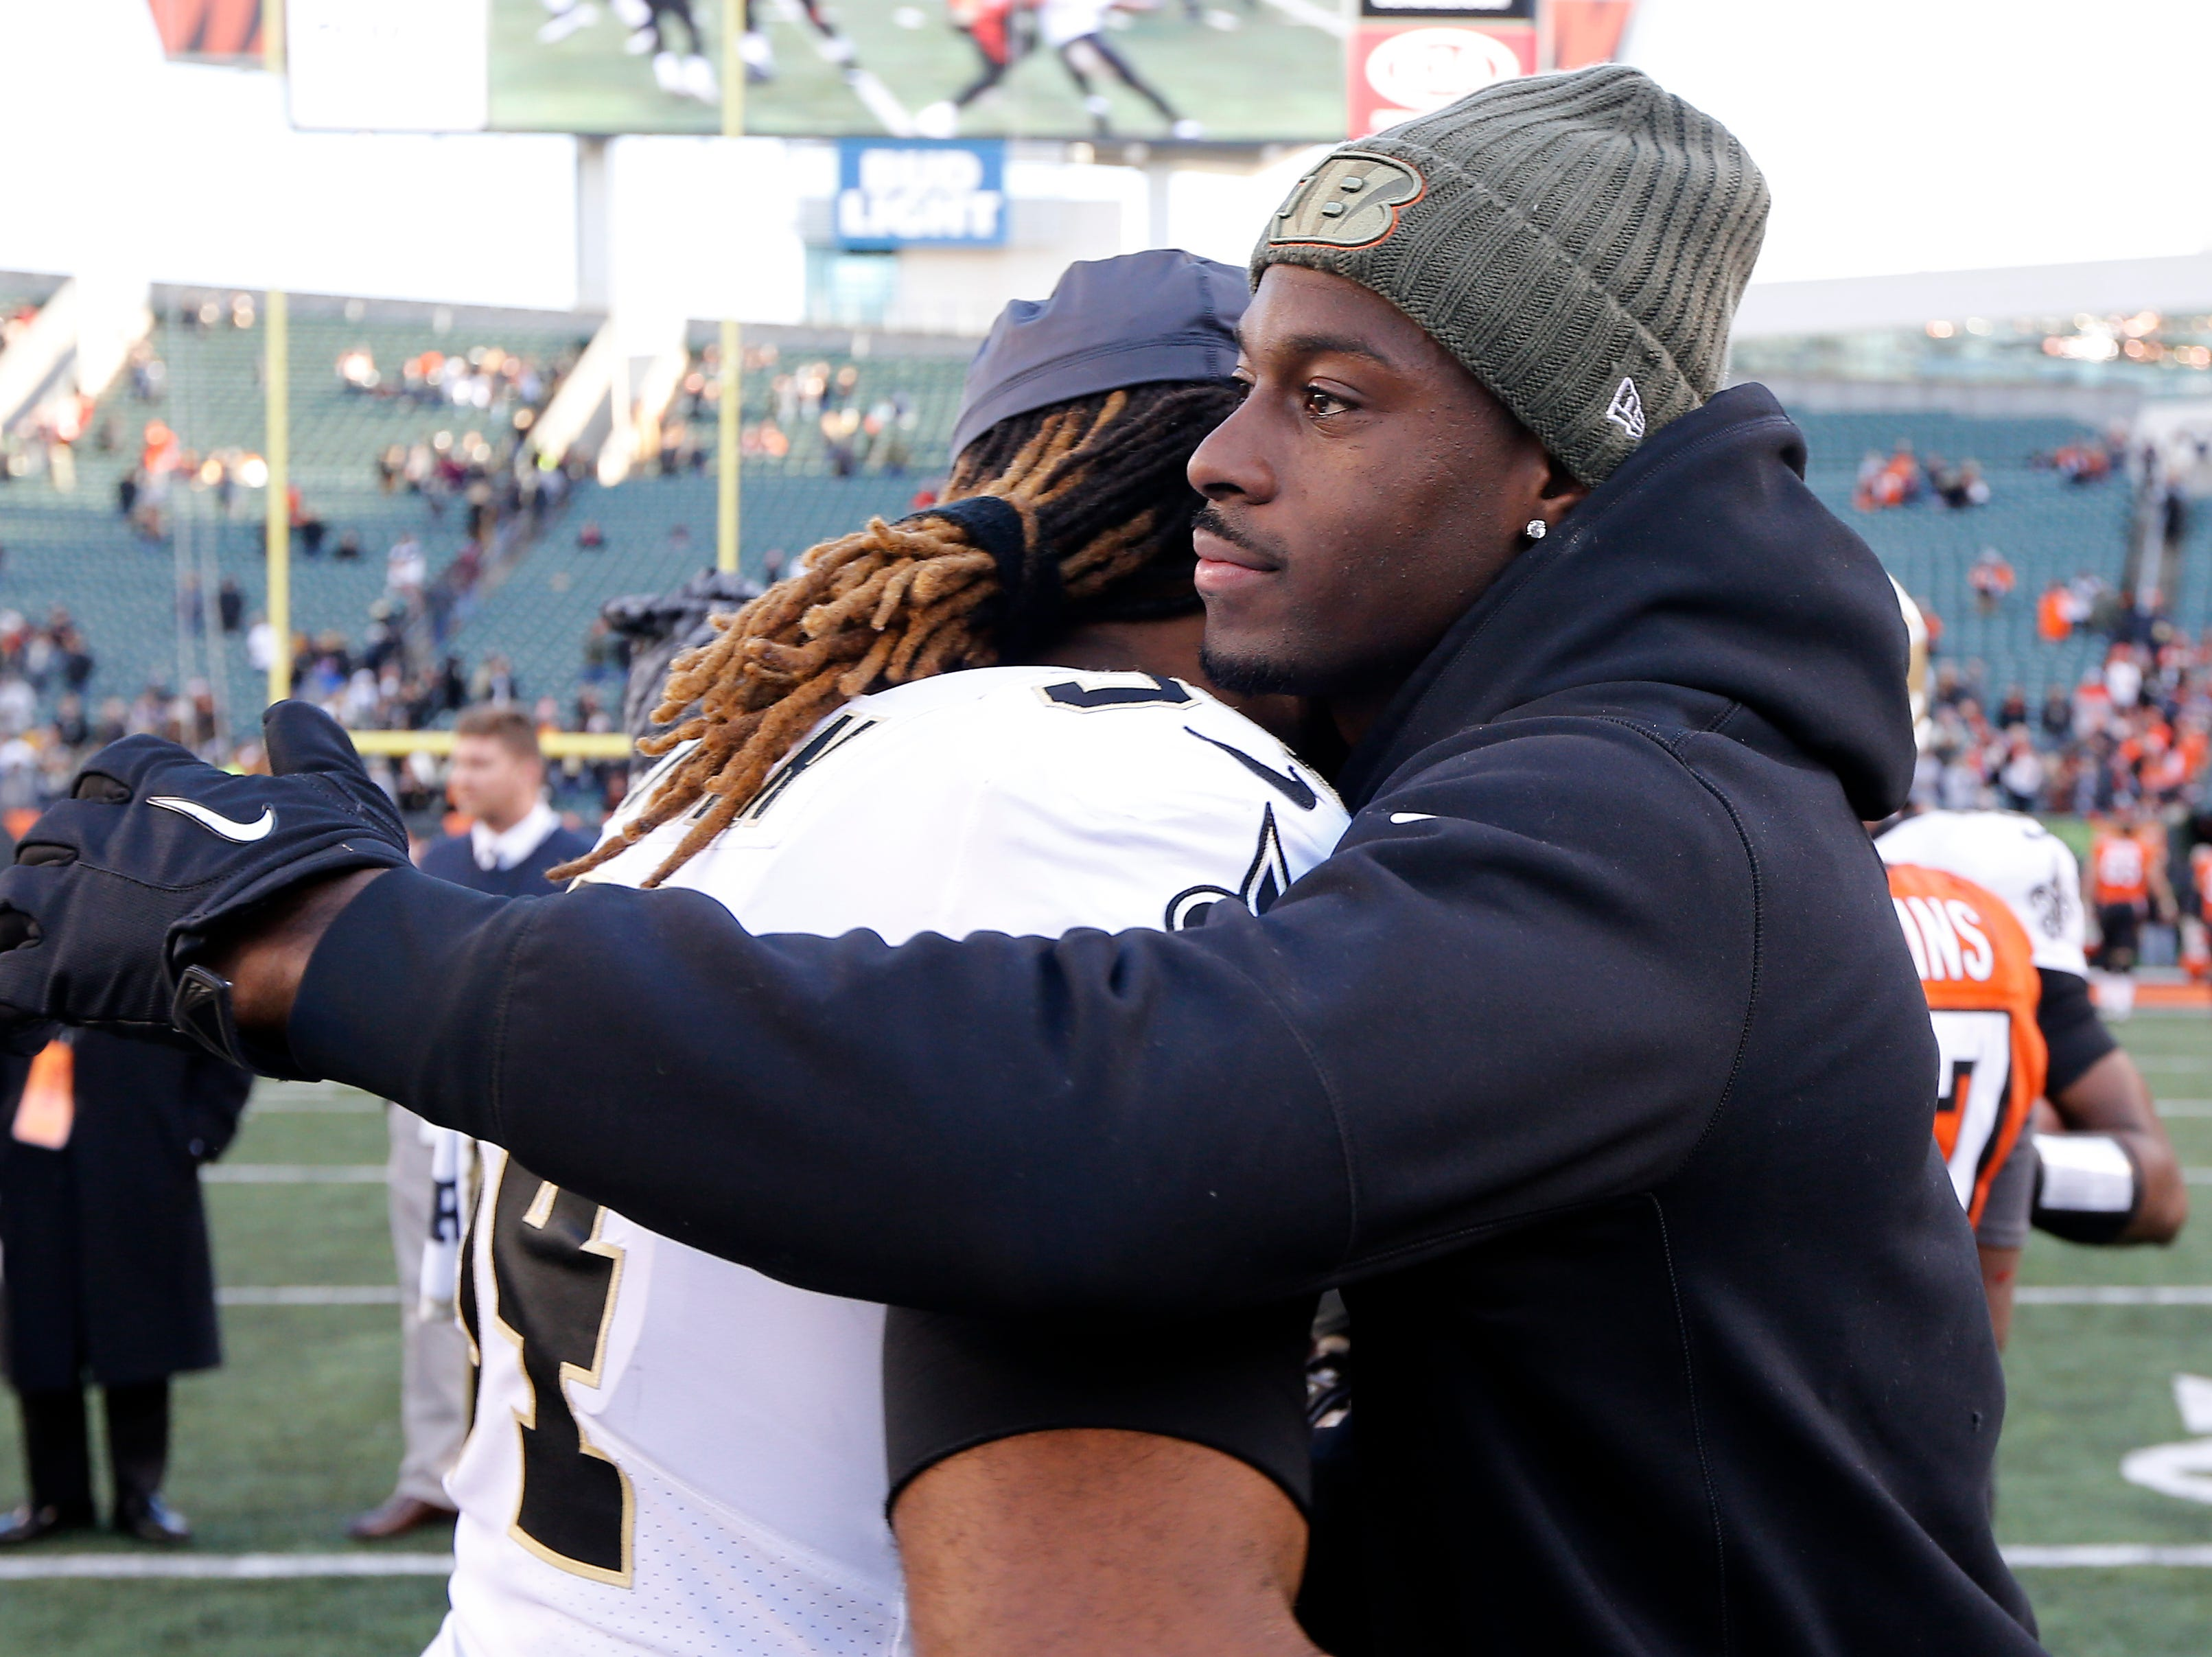 New Orleans Saints defensive end Cameron Jordan (94) hugs injured Cincinnati Bengals wide receiver A.J. Green (18) after the NFL Week 10 game between the Cincinnati Bengals and the New Orleans Saints at Paul Brown Stadium in downtown Cincinnati on Sunday, Nov. 11, 2018. The Saints beat the Bengals 51-14.